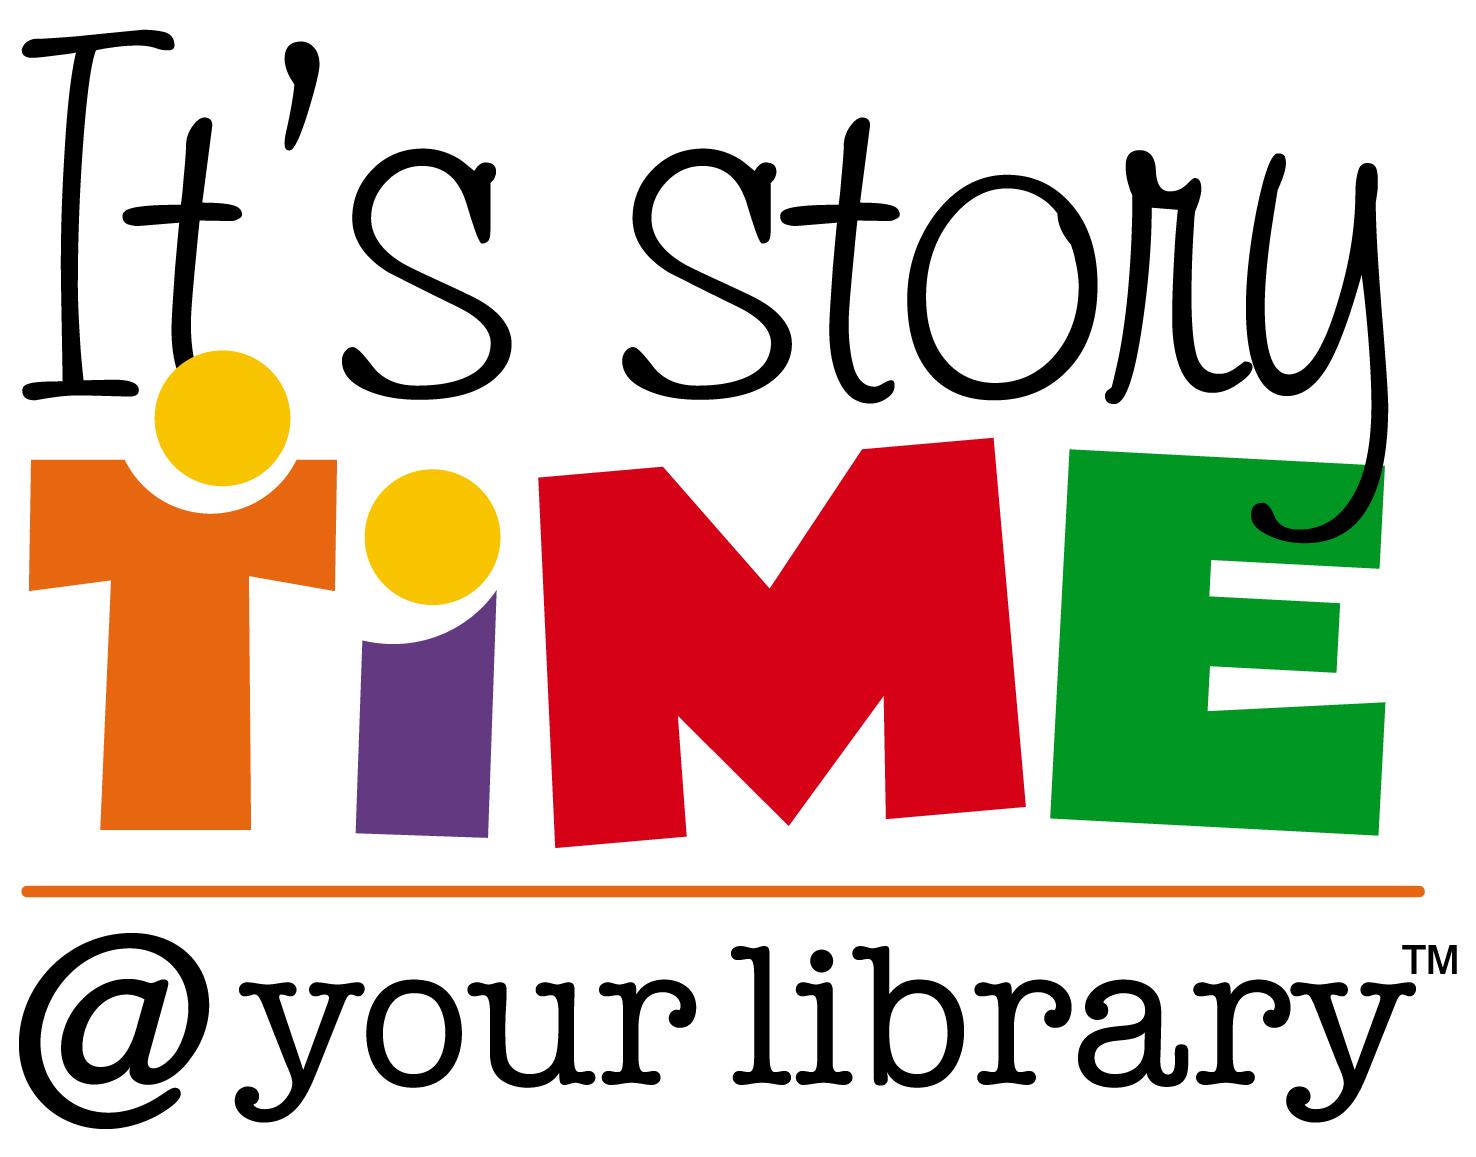 Public Library Clip Art.